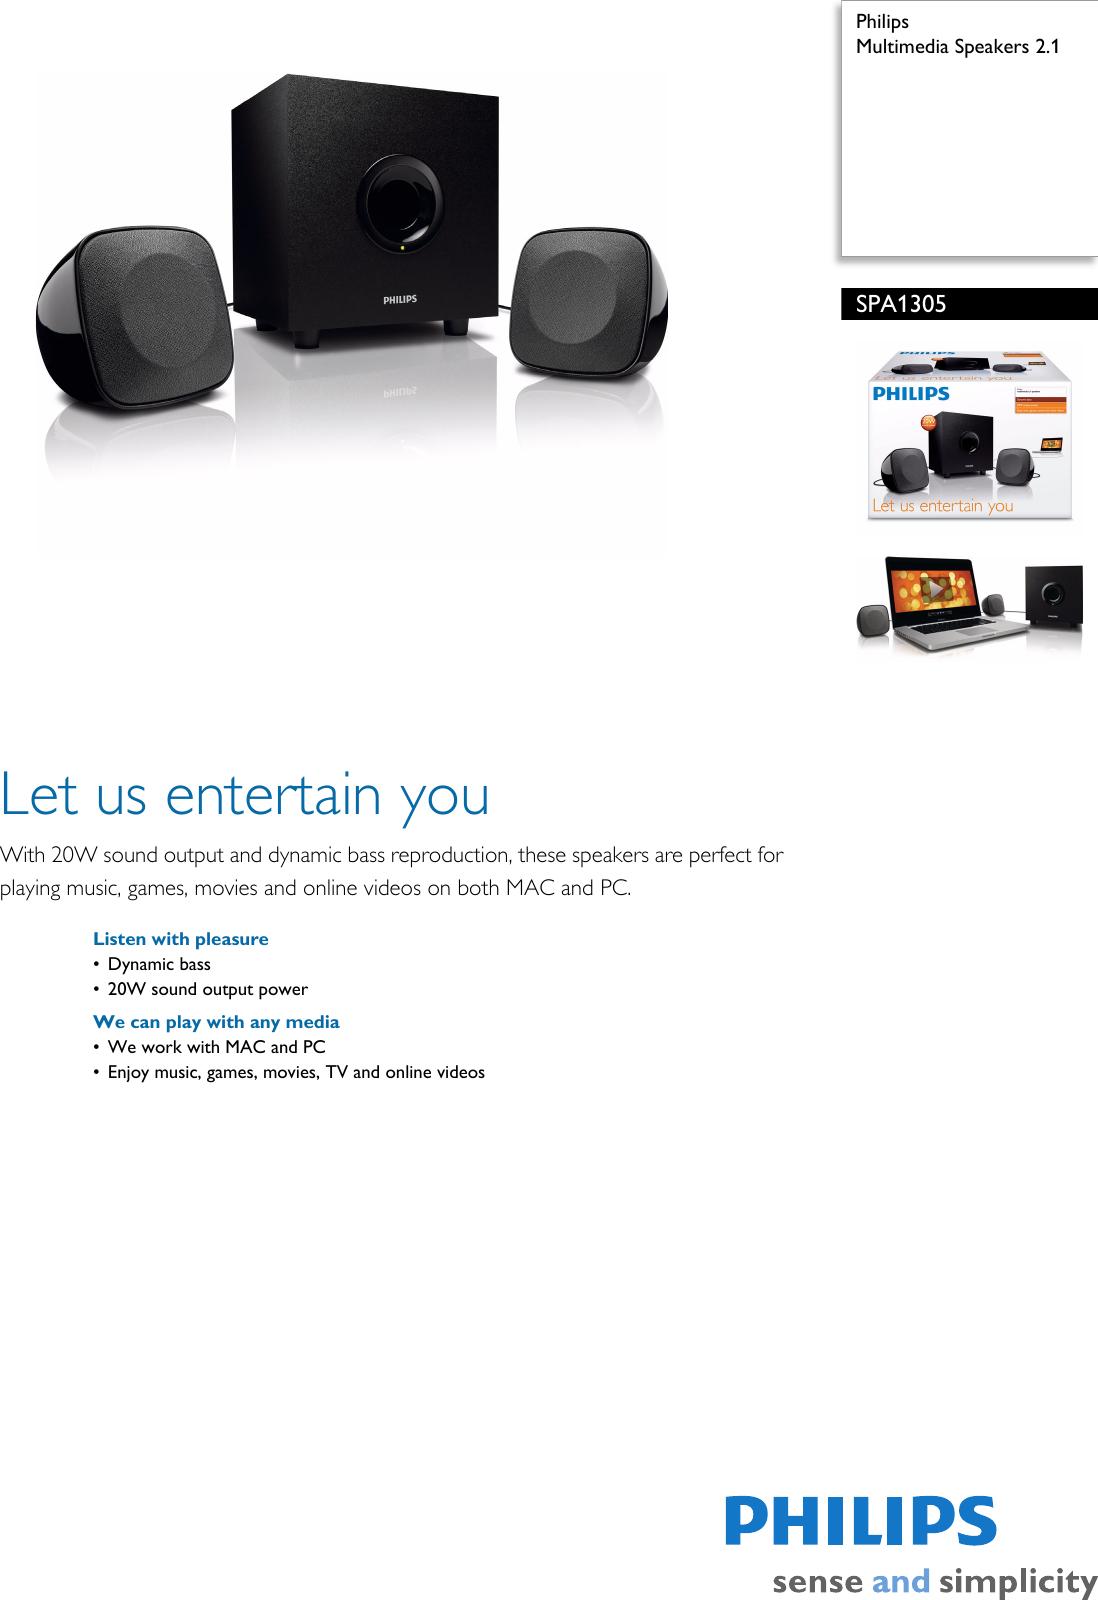 philips spa1305 10 multimedia speakers 2 1 user manual leaflet rh usermanual wiki Philips User Guides Speaker Bt7900 Philips TV User Manual